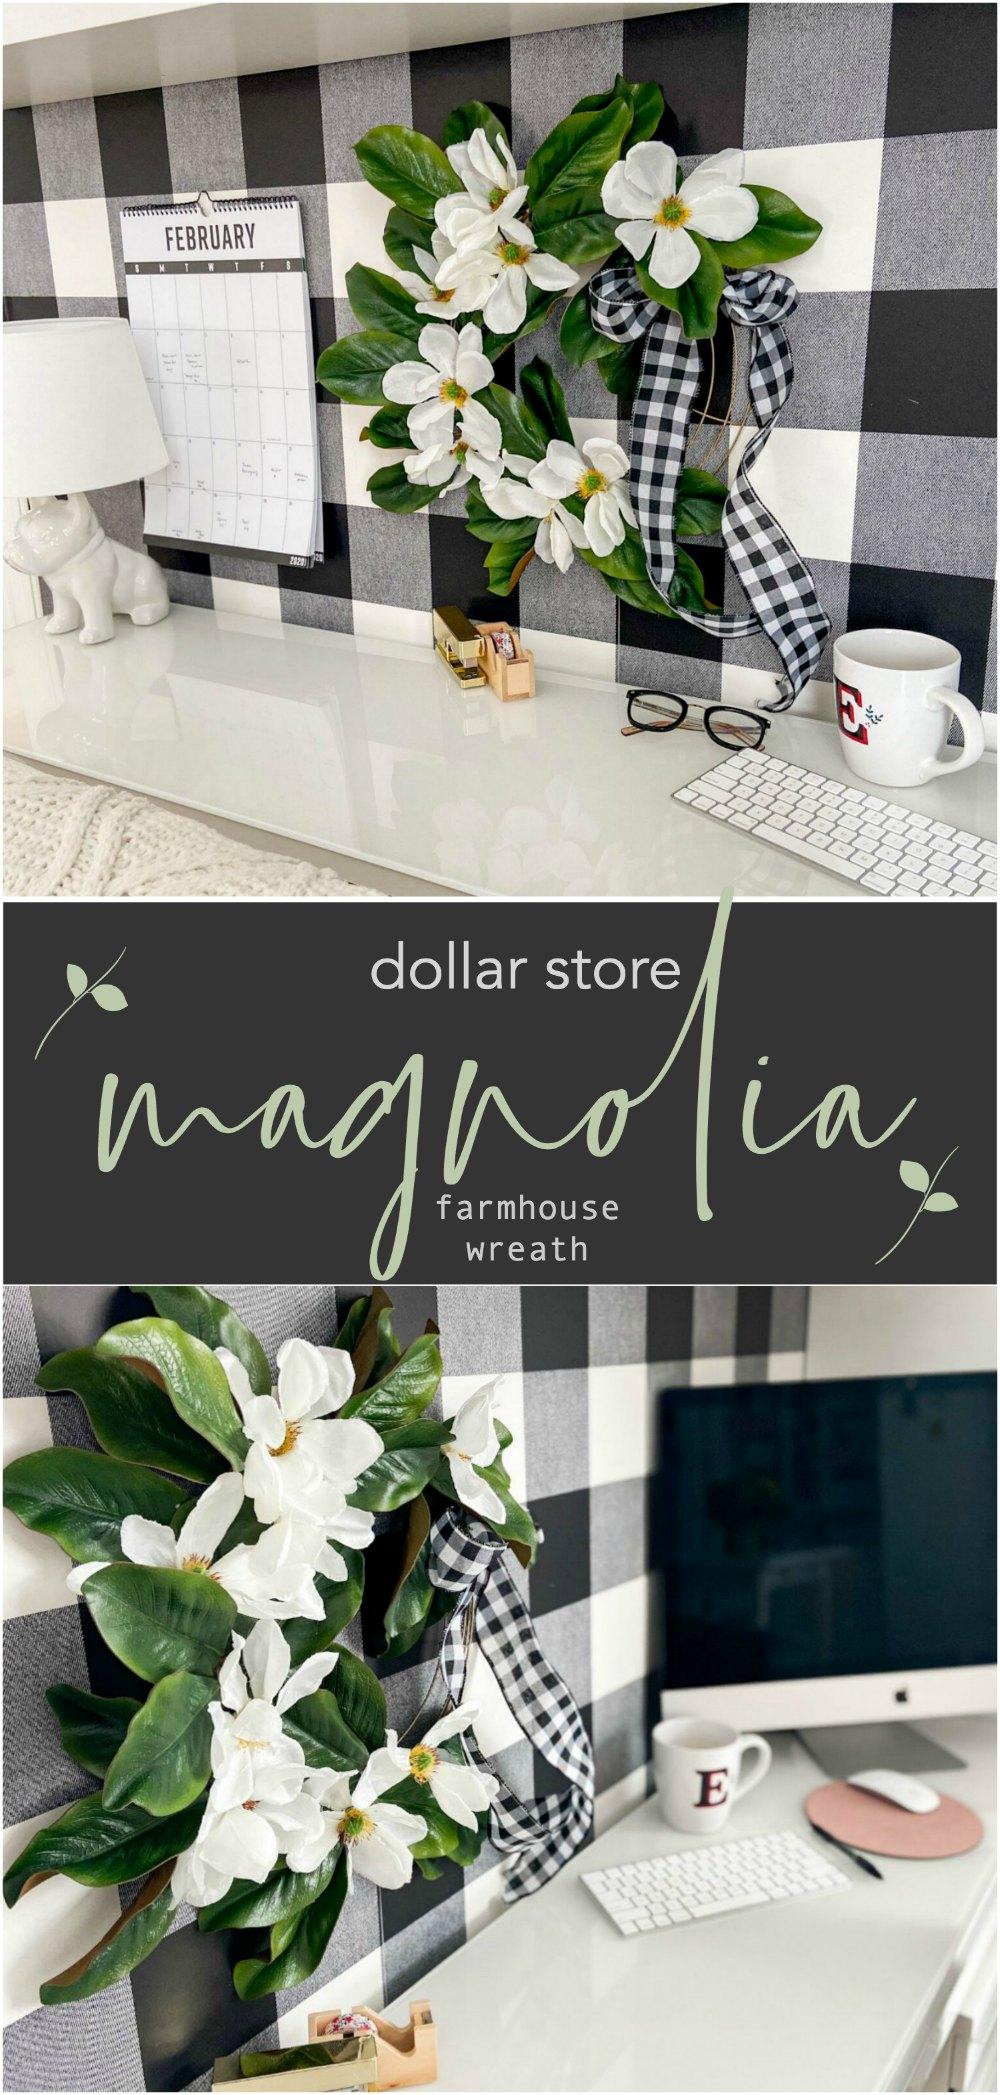 foto de Dollar Store Magnolia Farmhouse Wreath DIY + 18 Wreath Ideas